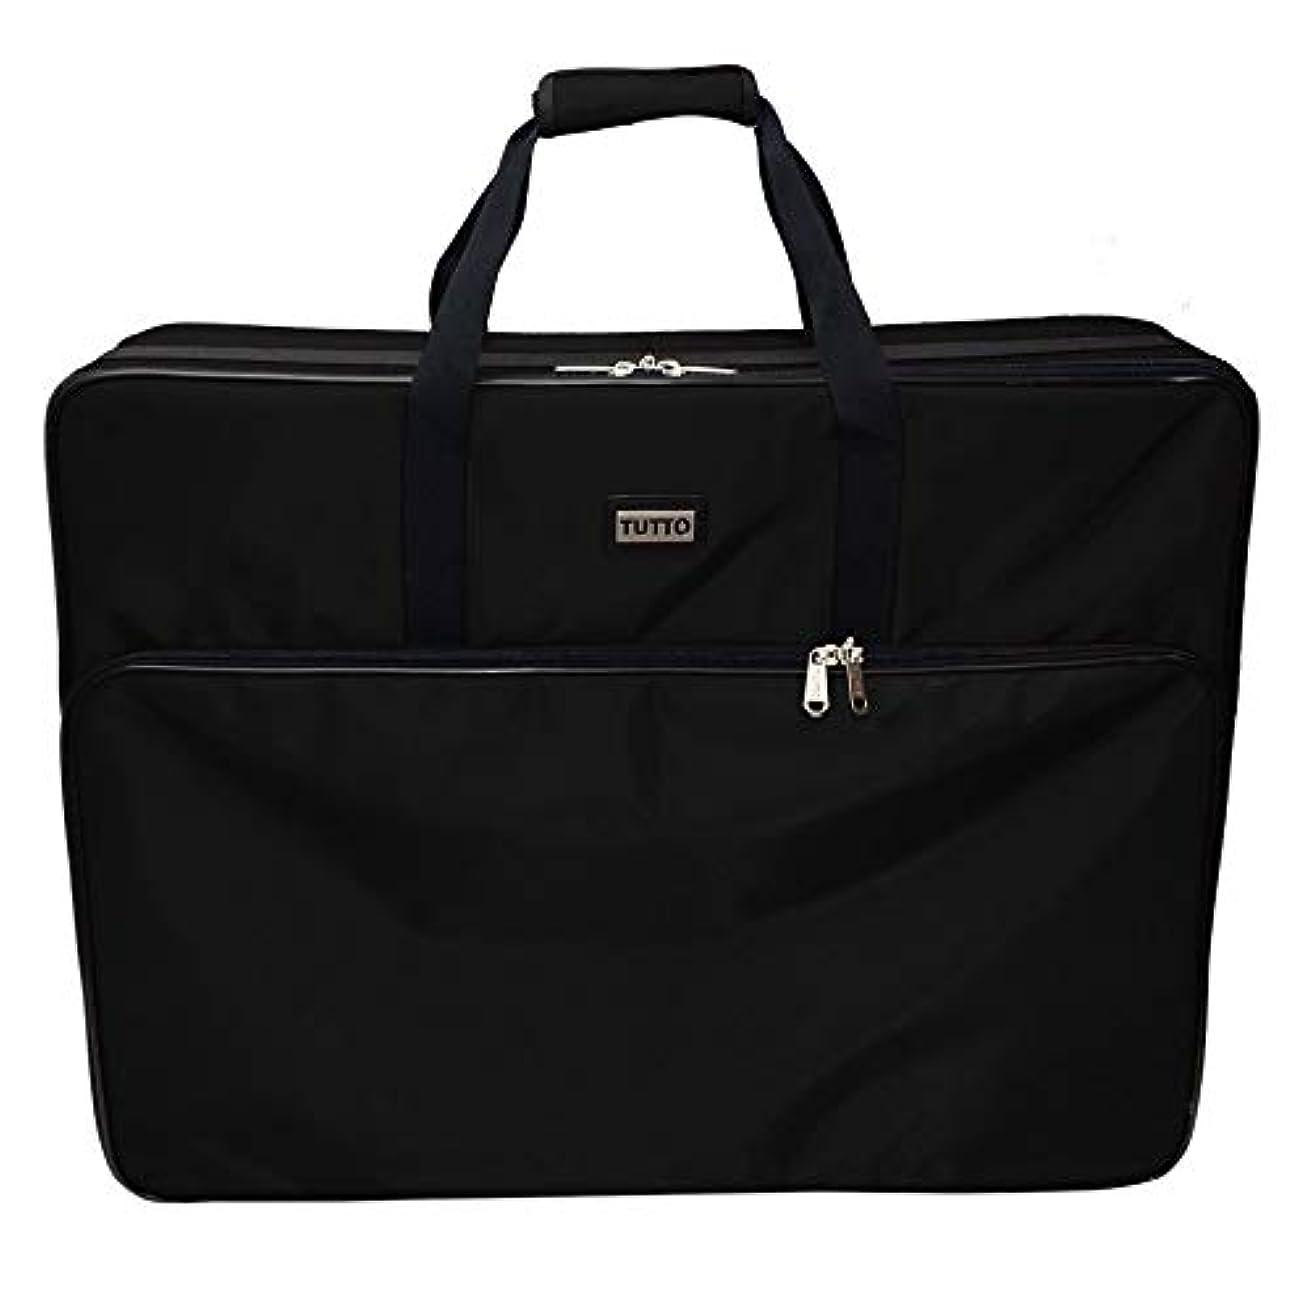 Mascot Metropolitan Tutto Embroidery Machine Bag 26in Large Black, 26